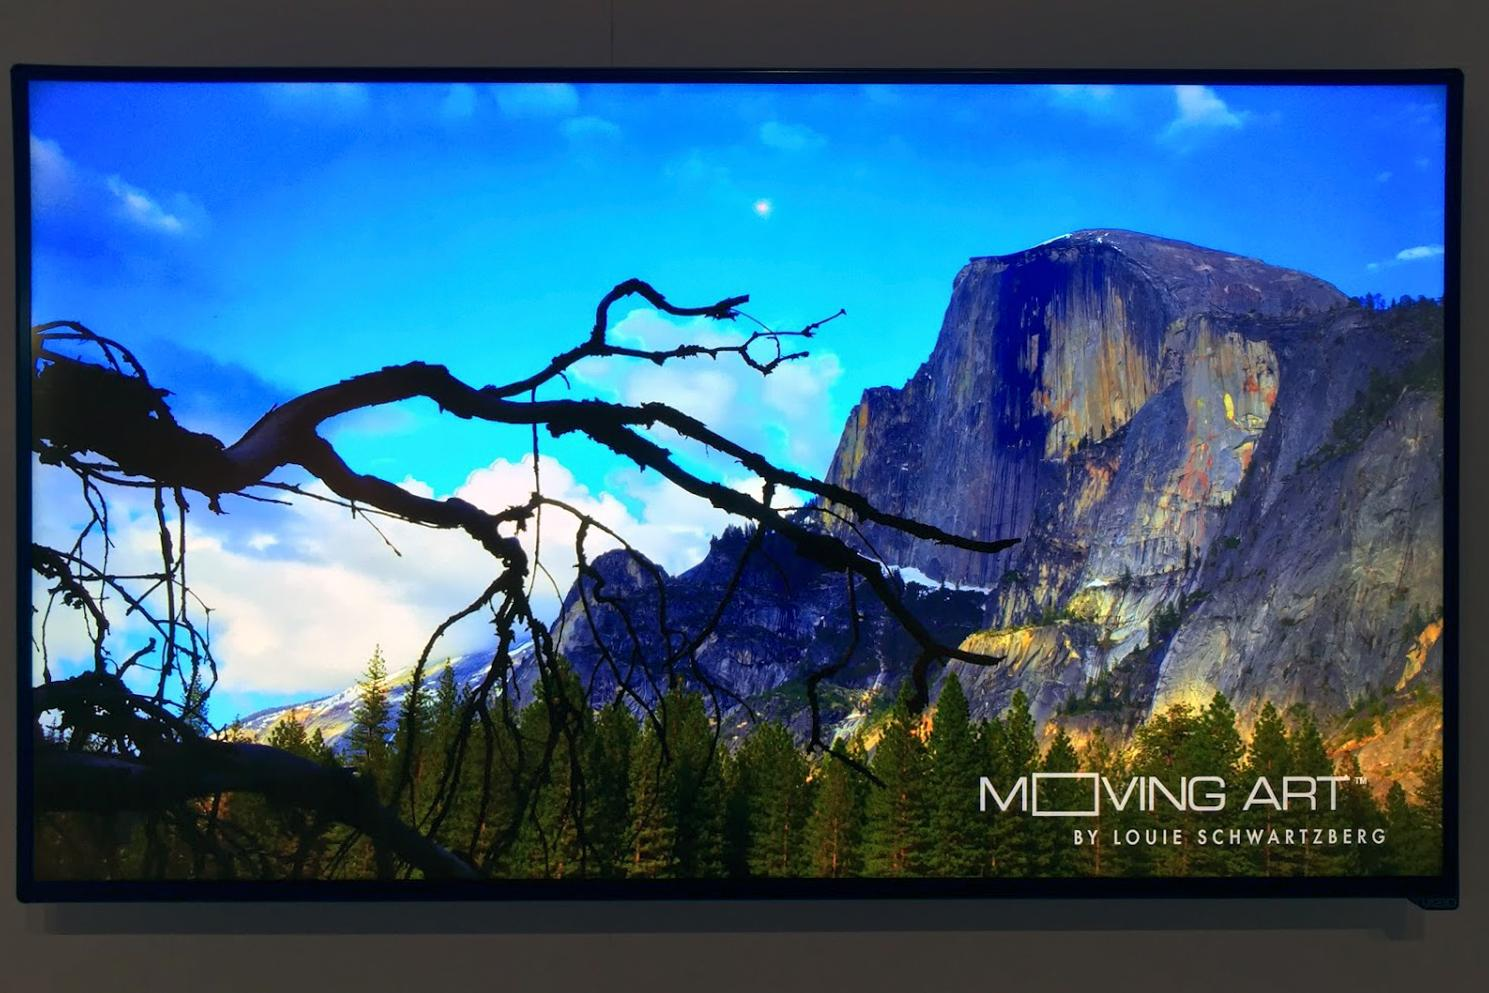 vizio tv 55 inch 4k. vizio 4kultra hd televisions announced start at 1000 p series tv 55 inch 4k